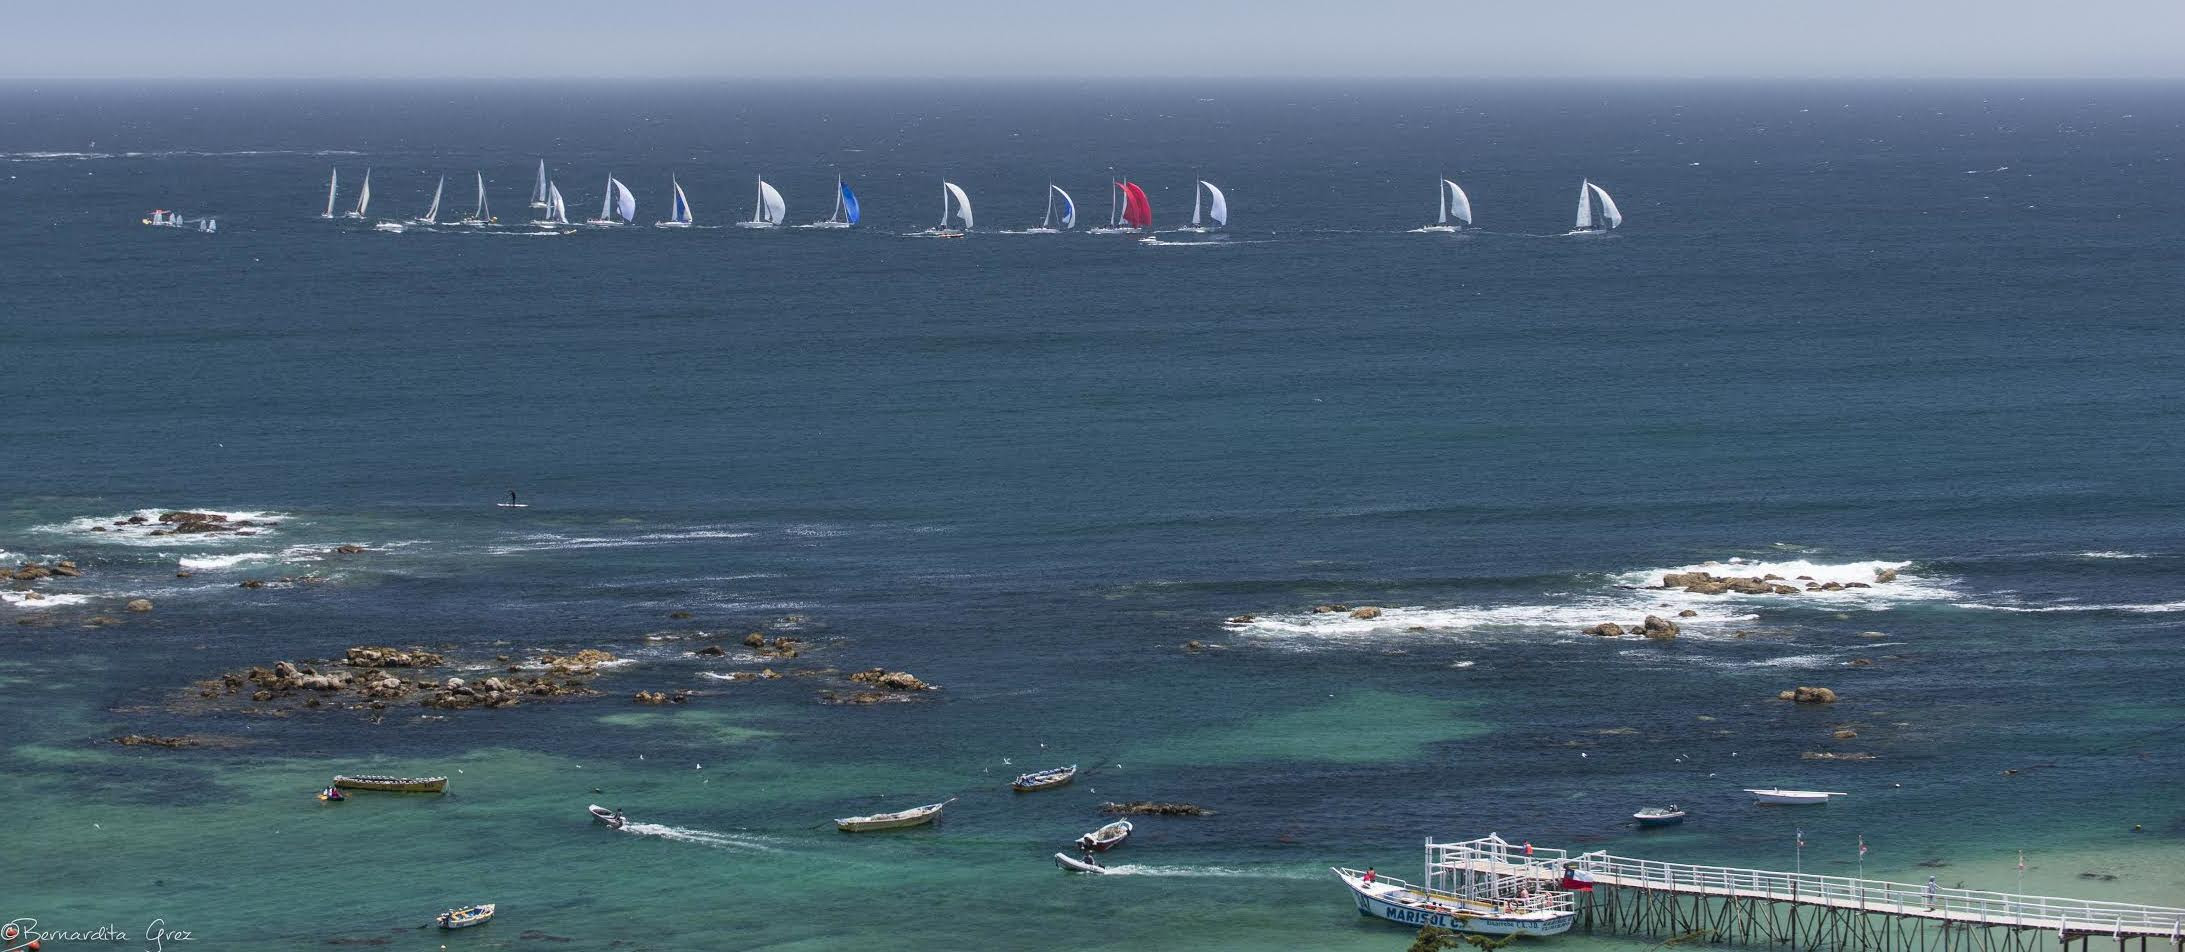 J/105s sailing off Algarrobo, Chile